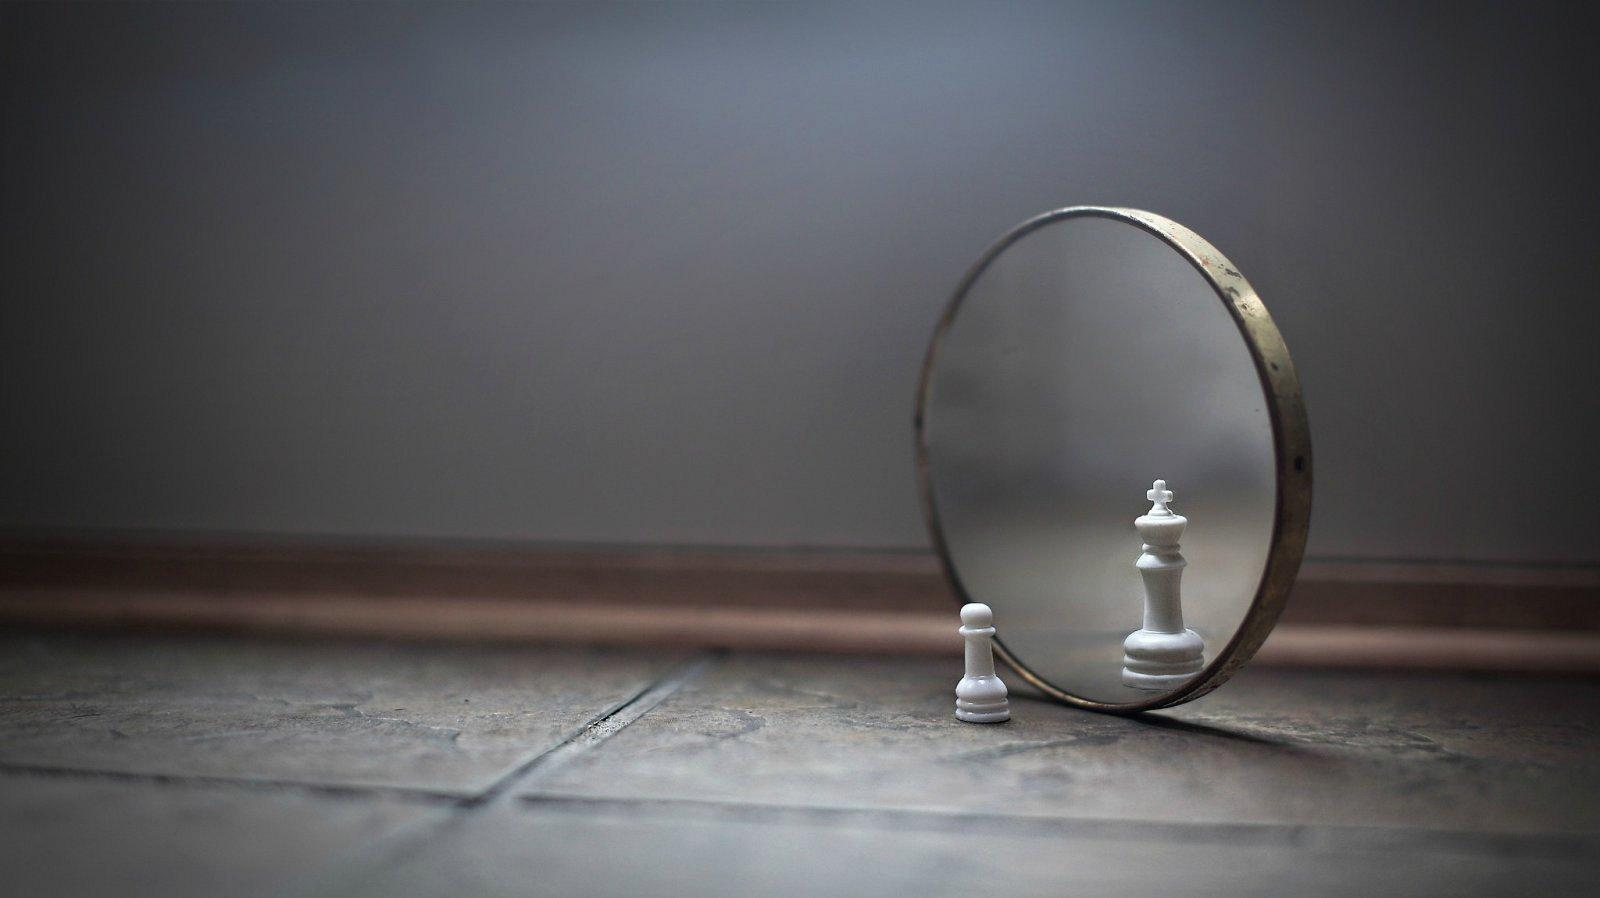 10 Ways to Improve Self-esteem